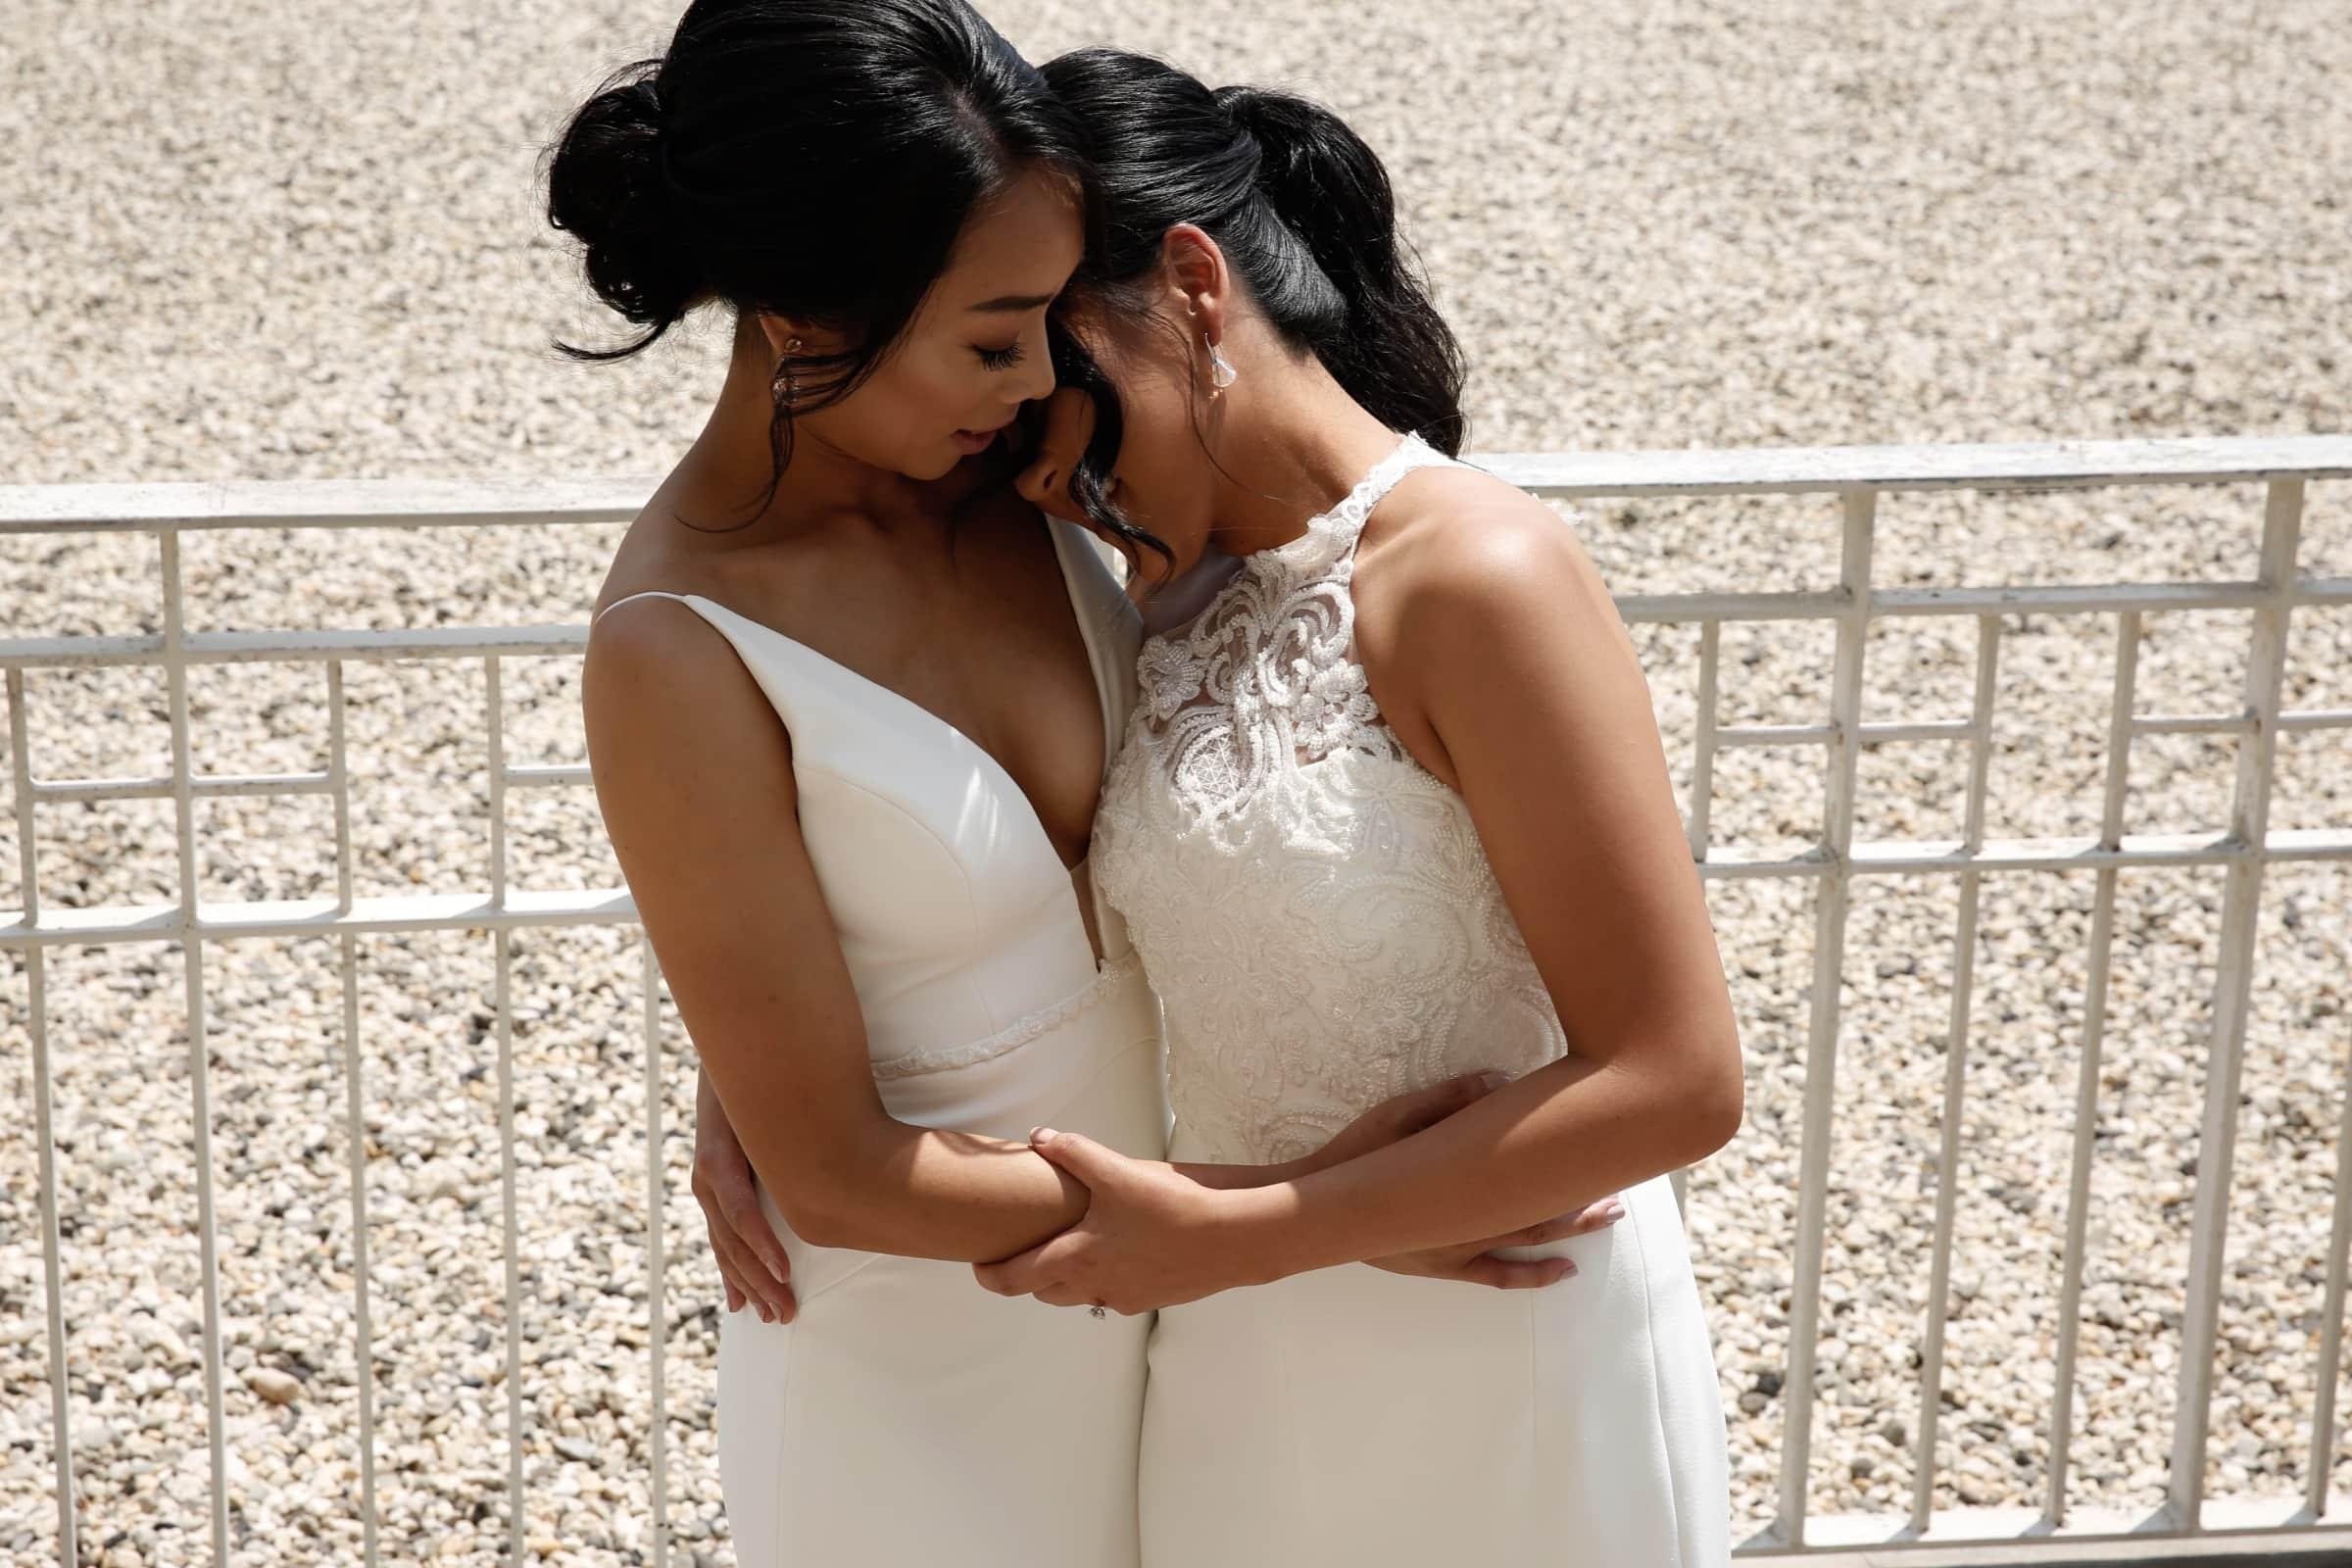 Aleem Yusuf Couture Melbourne Victoria Australia lesbian same-sex couple wedding dress attire Dancing With Her